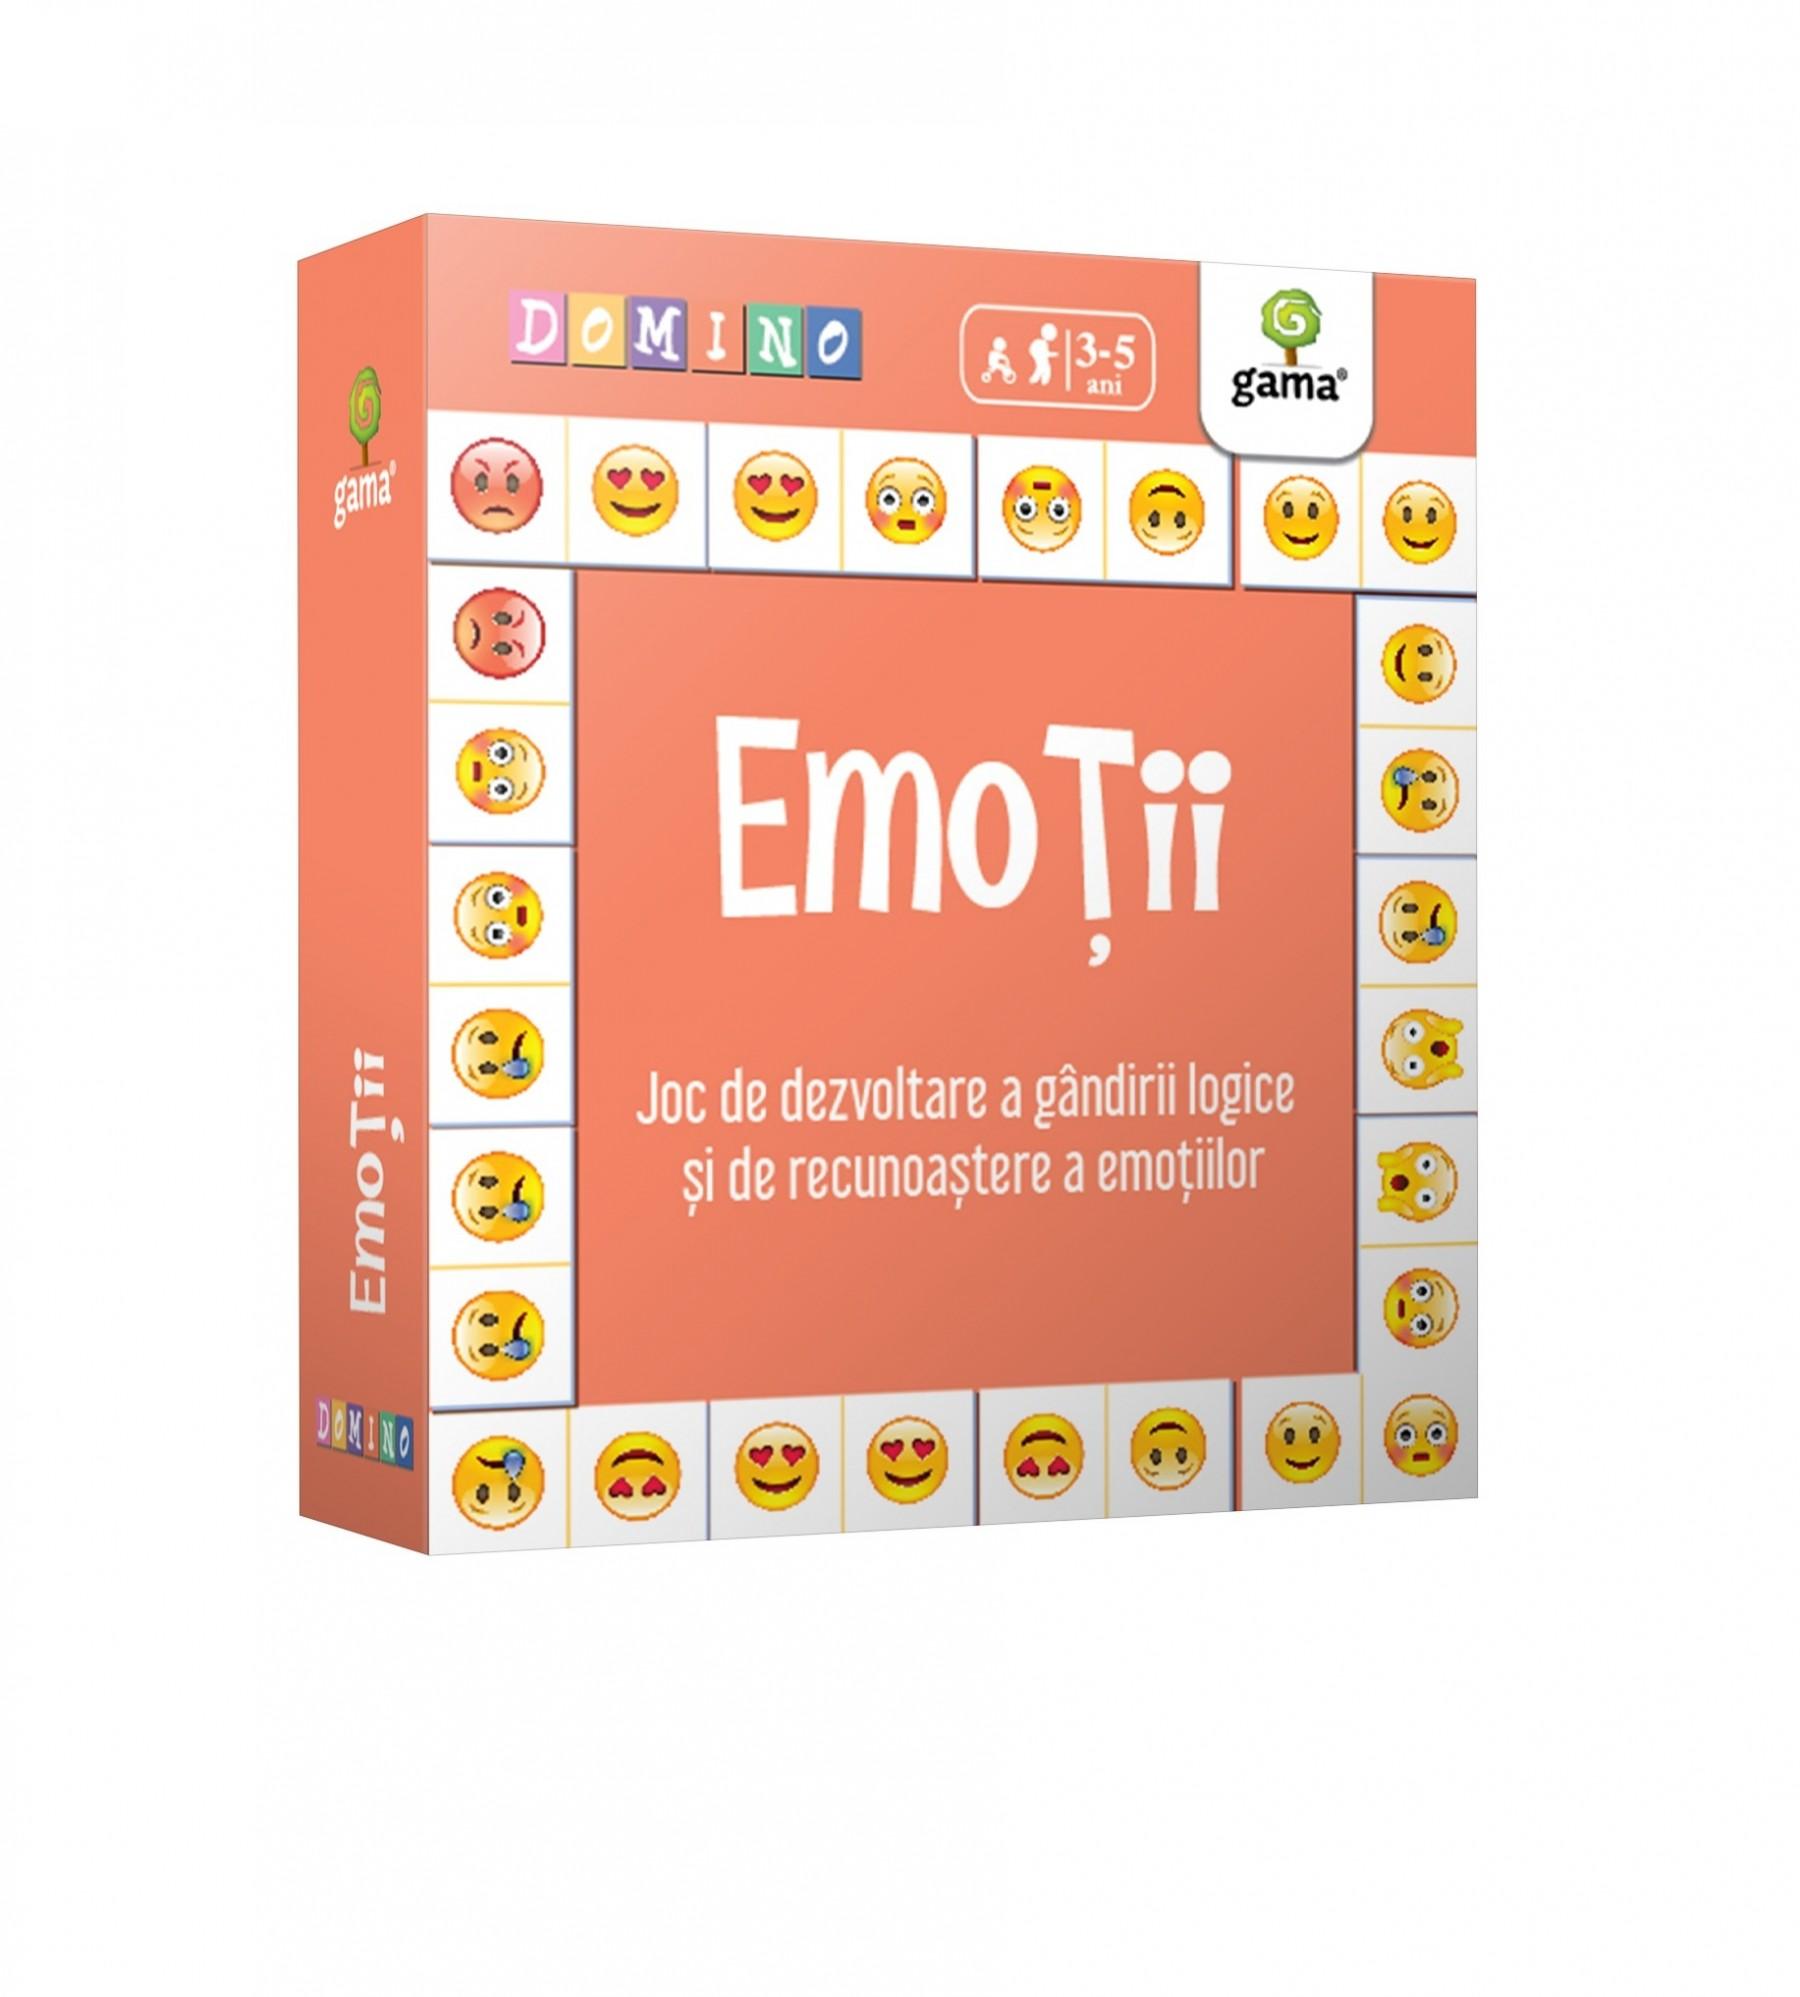 cutie_emotii_domino